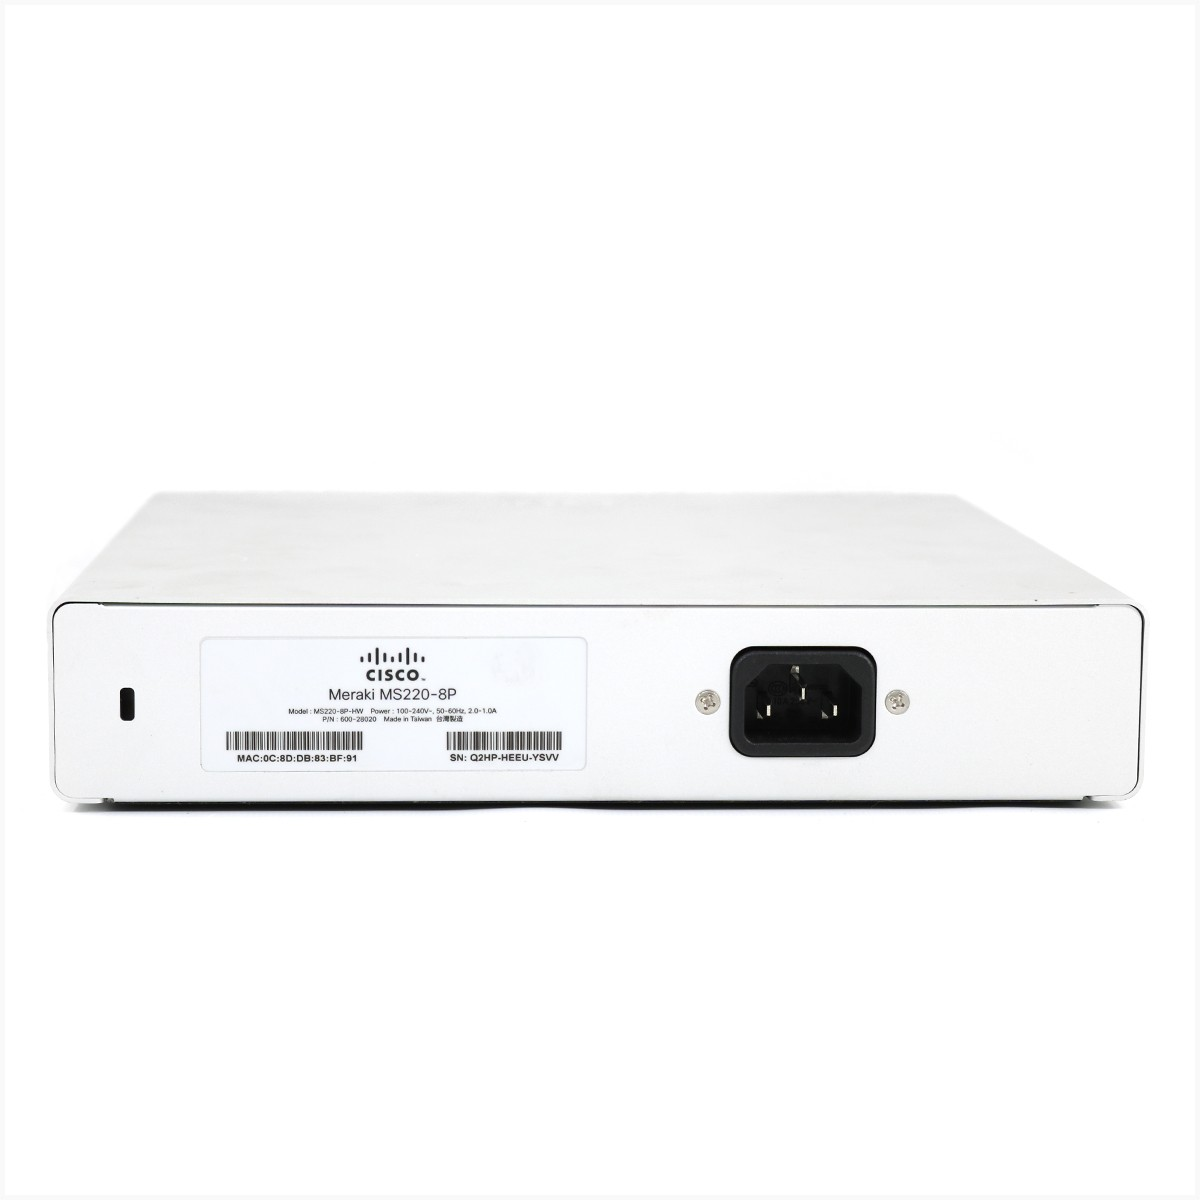 Switch cisco meraki ms220-8p - usado